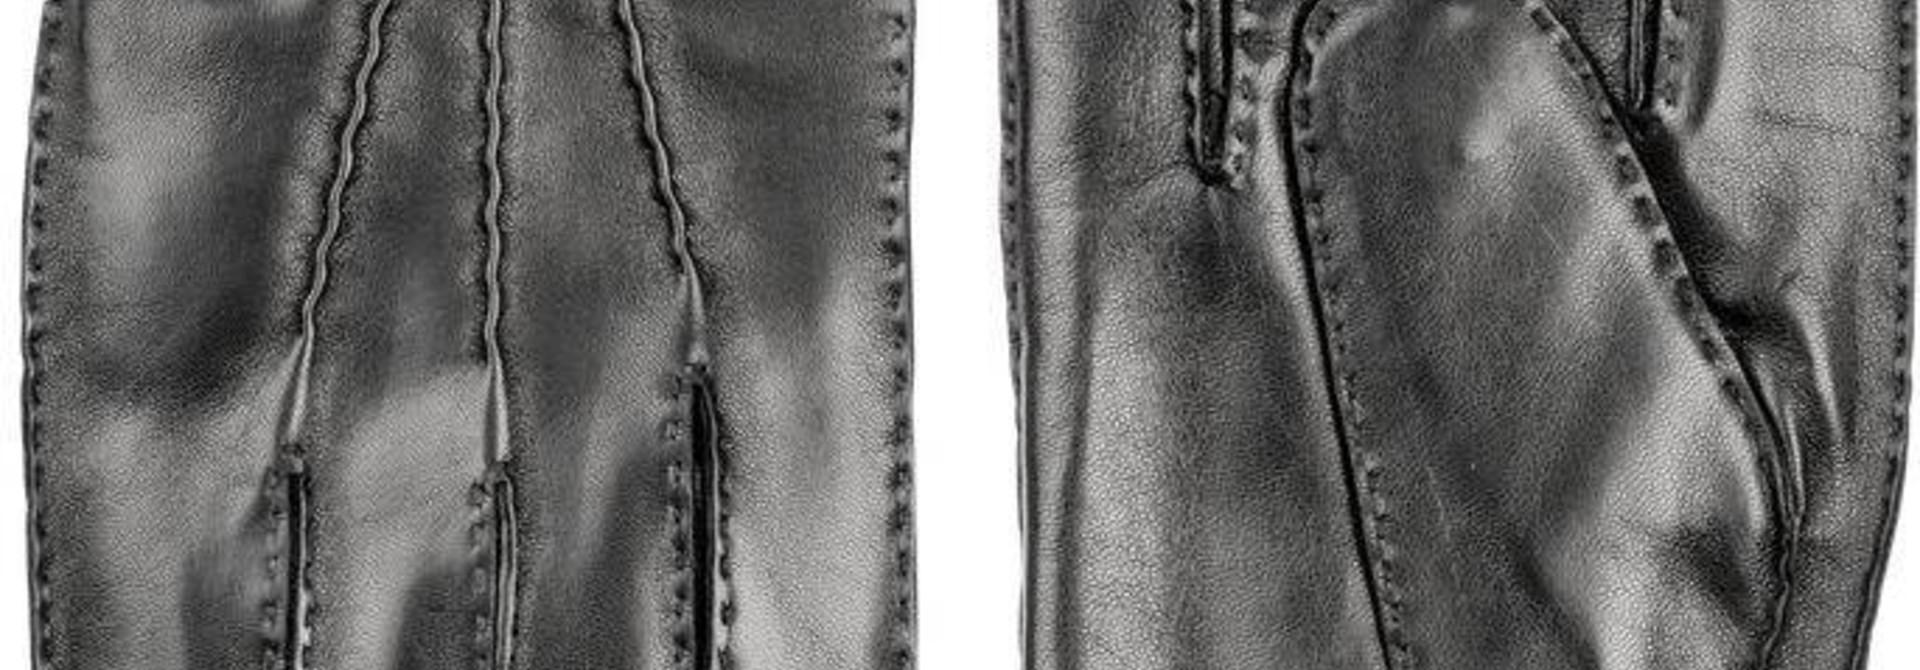 Jake Classic Hairsheep Leather Gloves Black